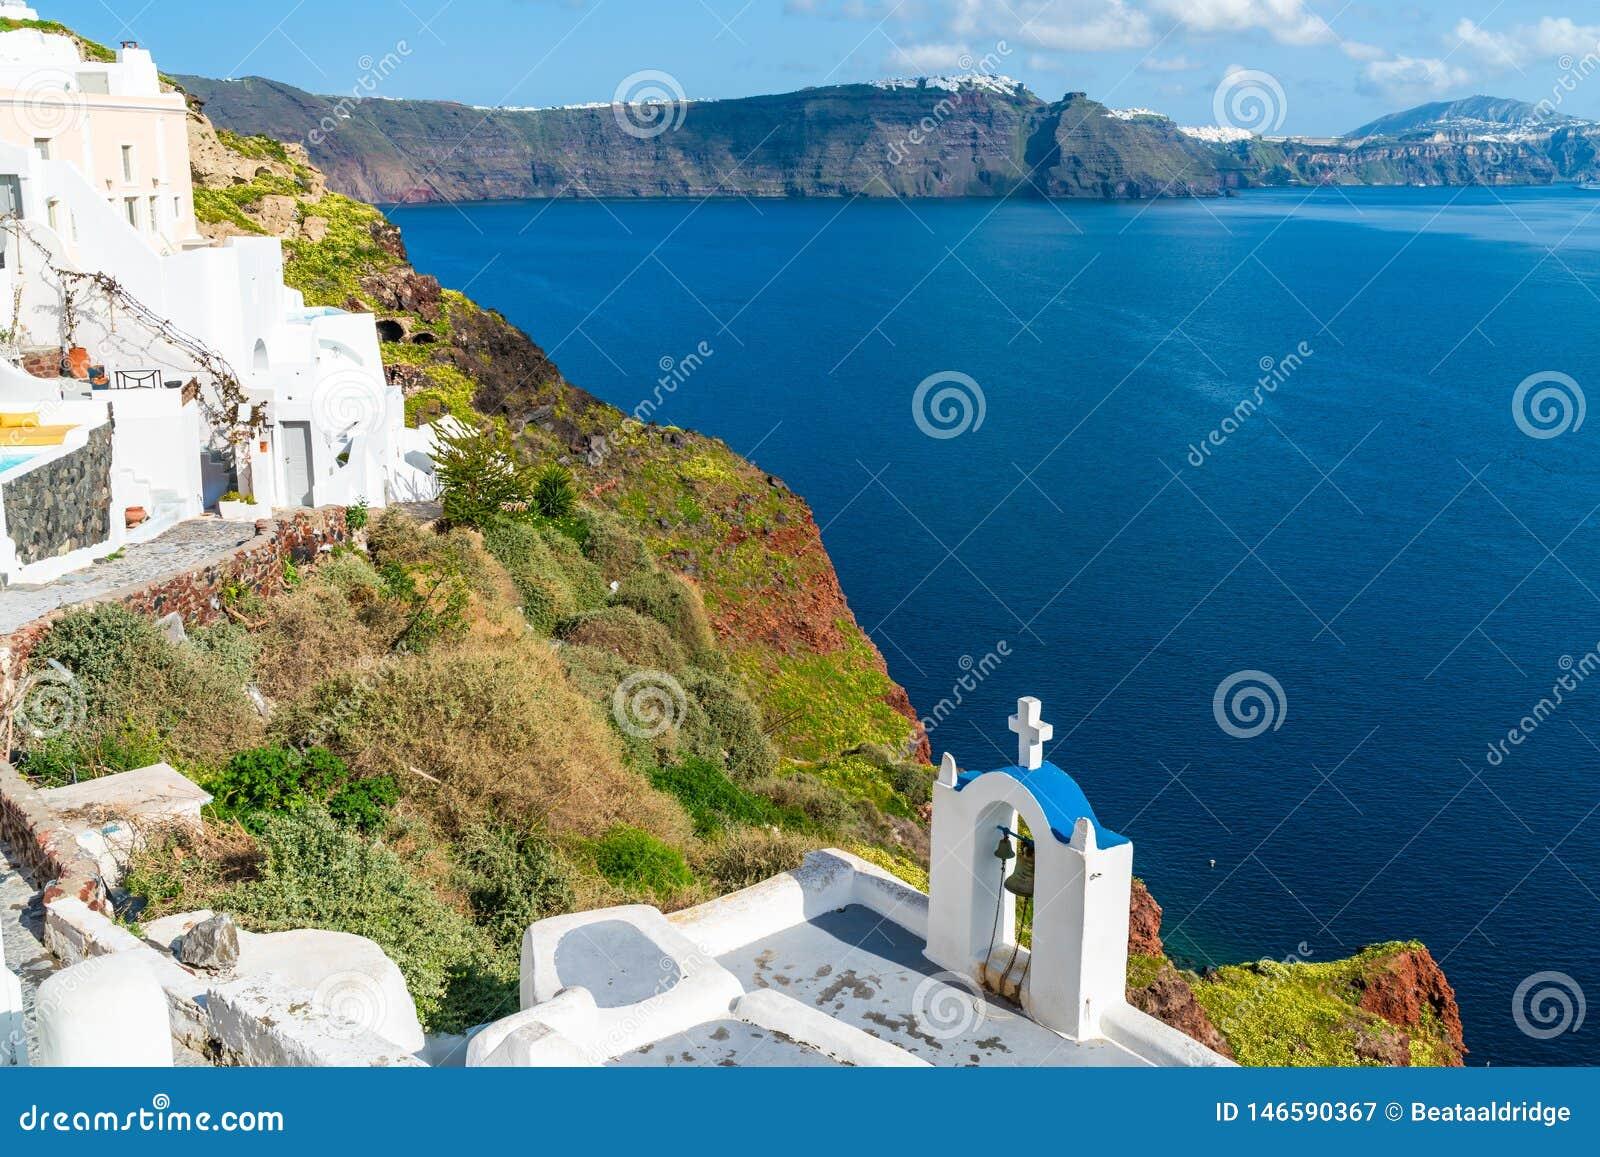 Santorini landscape in Oia with view of caldera and Aegean Sea